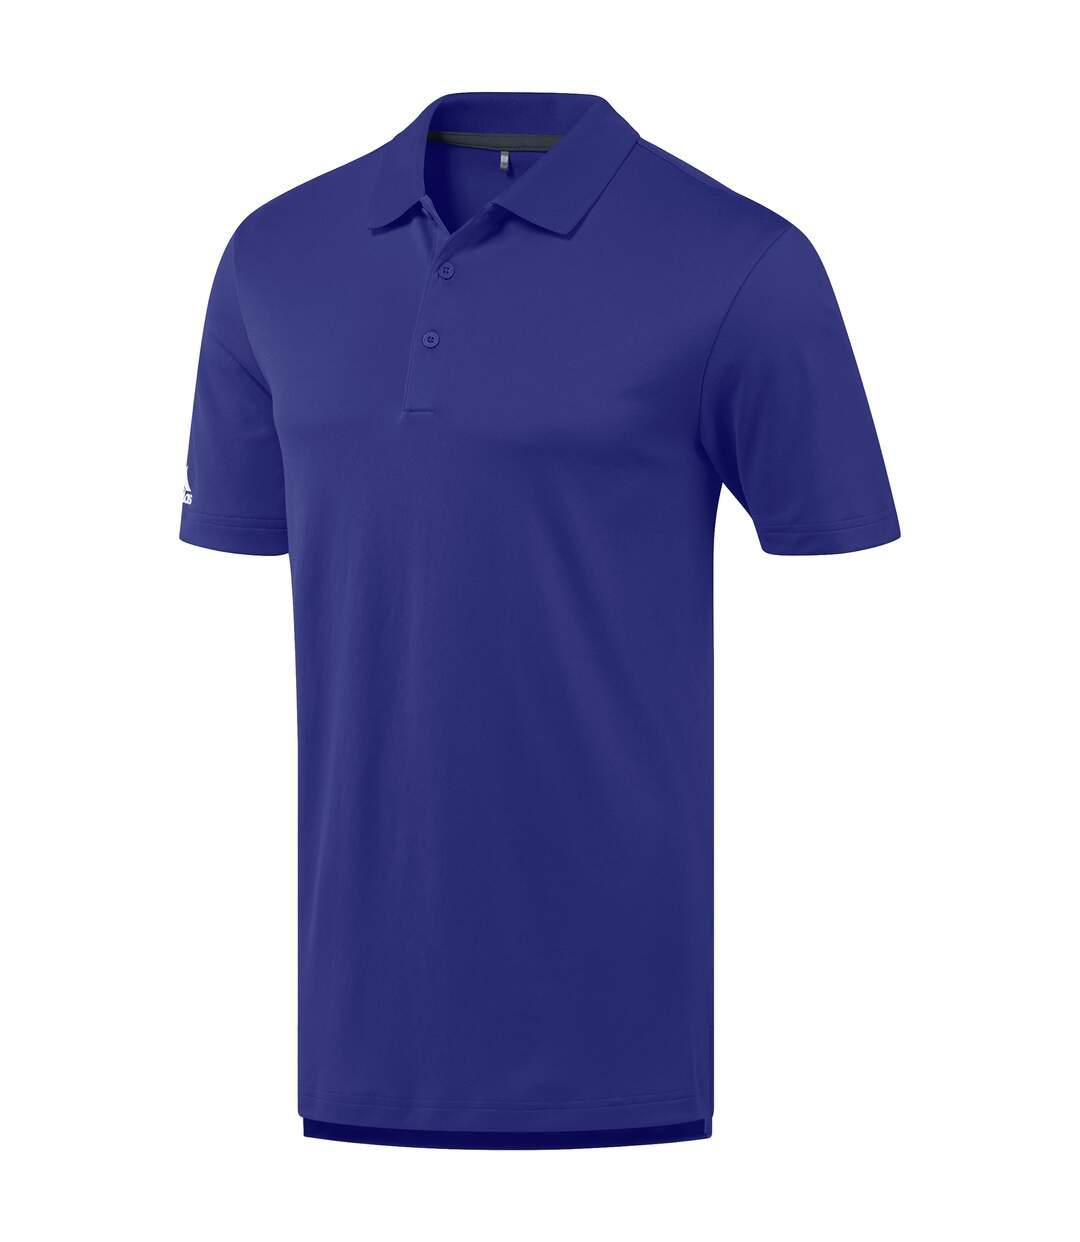 Adidas Mens Performance Polo Shirt (Collegiate Royal) - UTRW6133